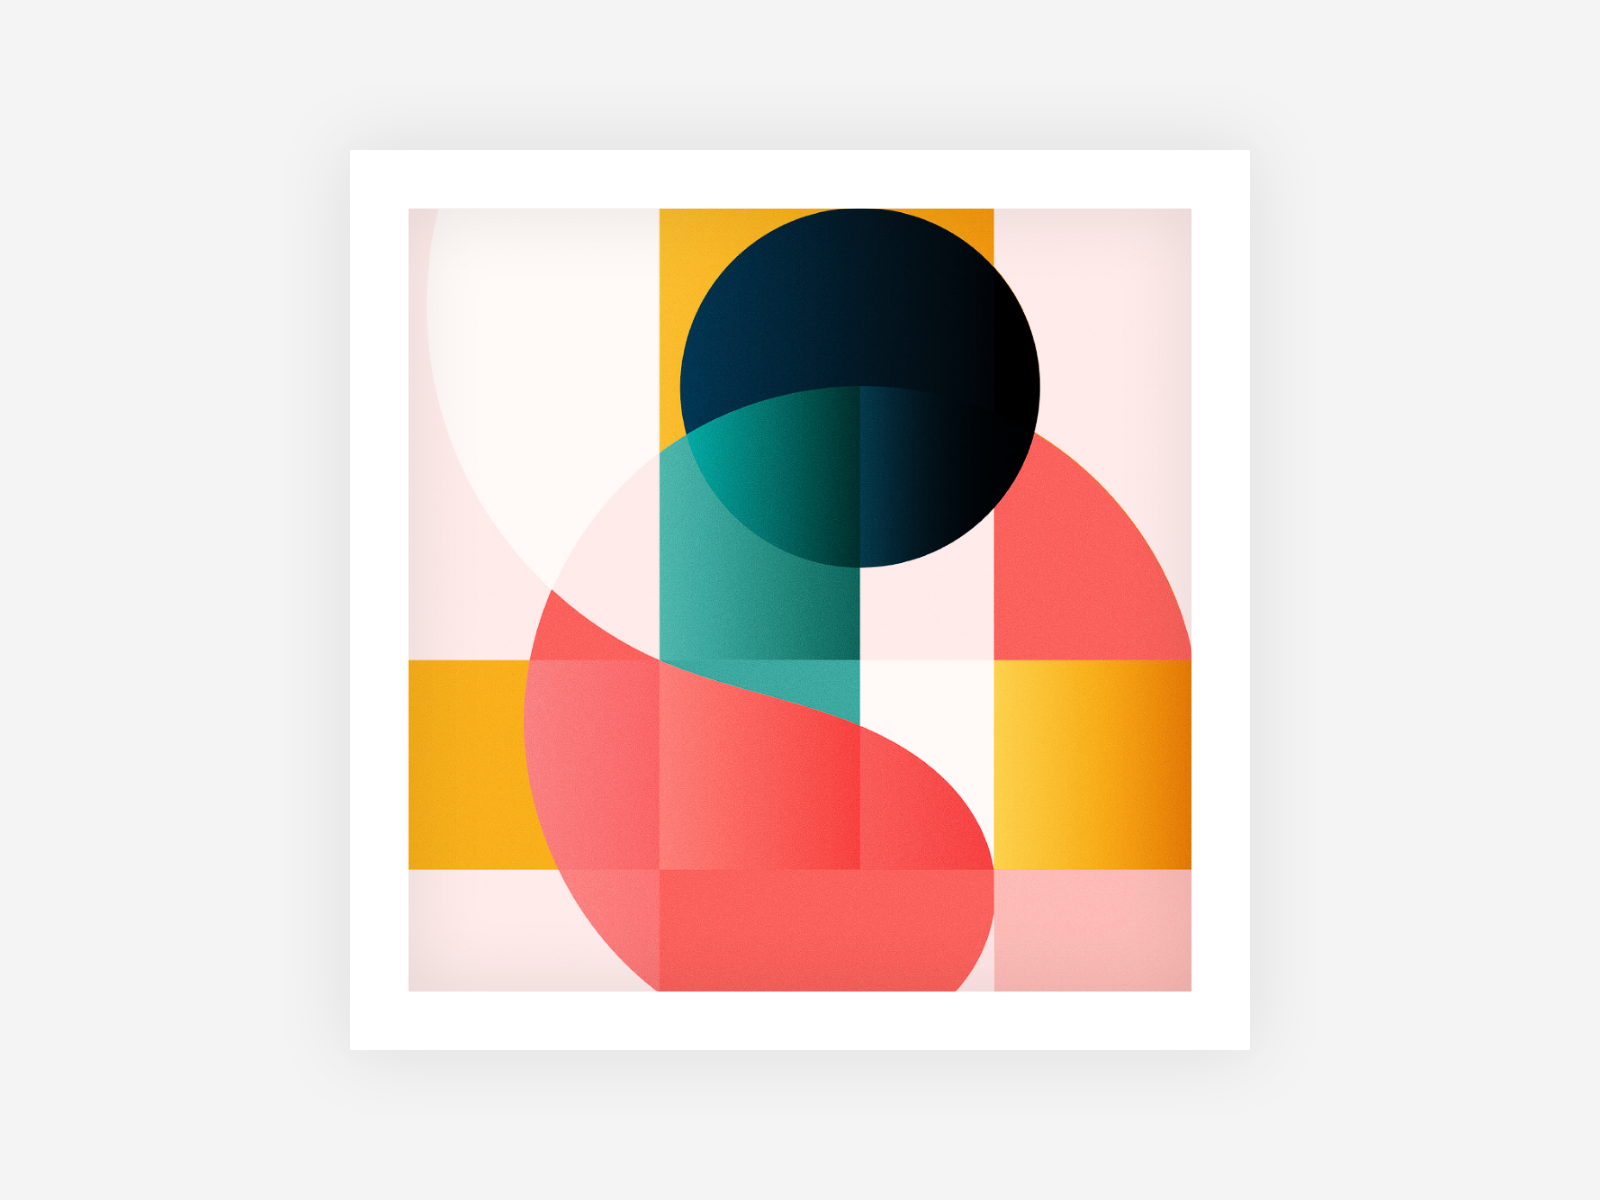 Vacation Time art colorpalette colors vivid graphic  design geometric poster